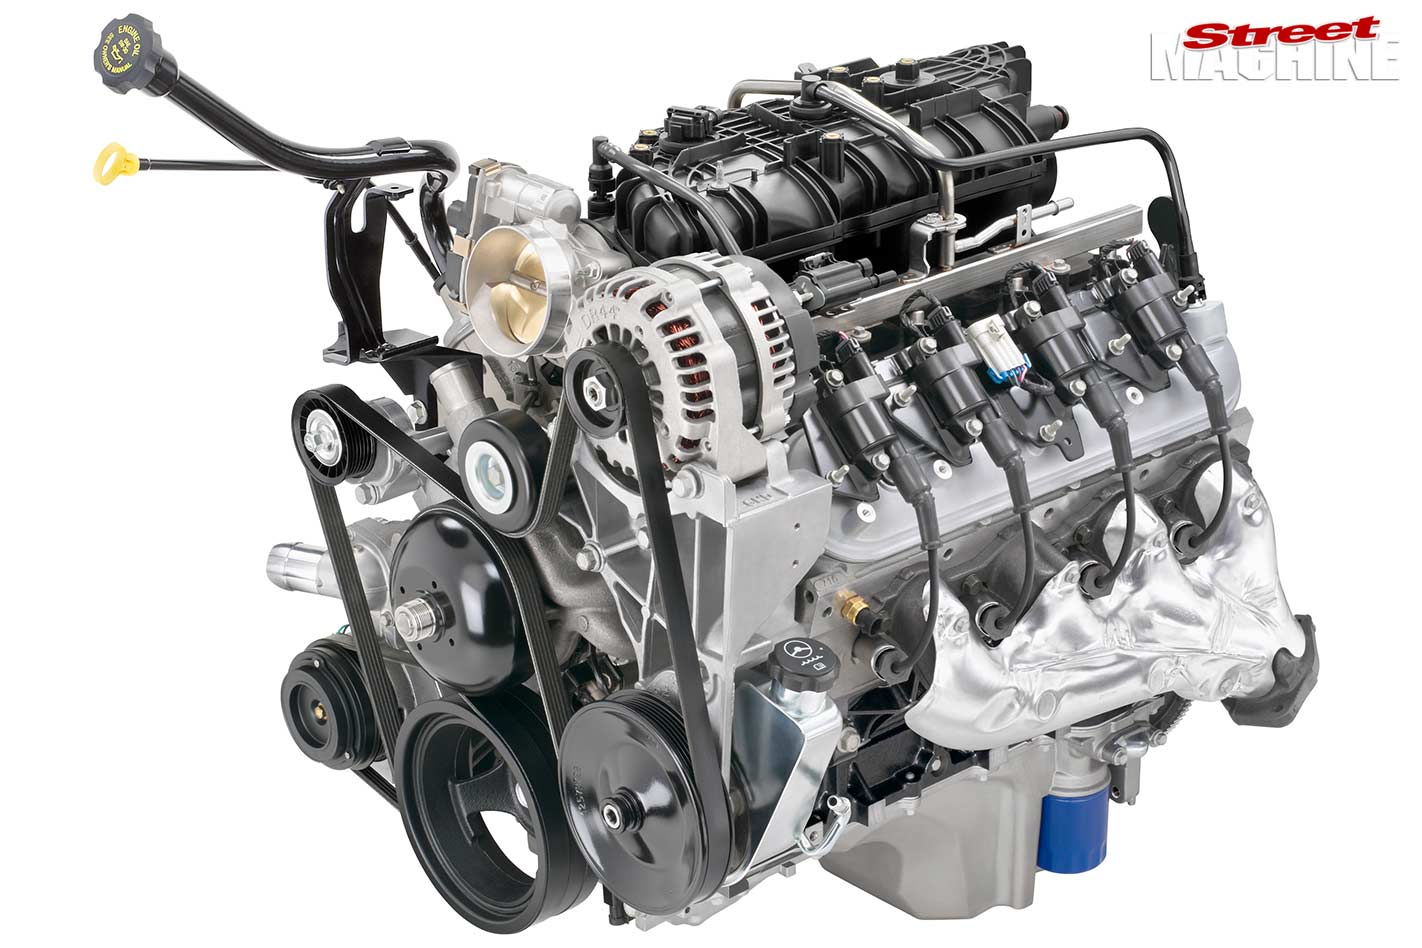 LS engine variants part two - Generation IV